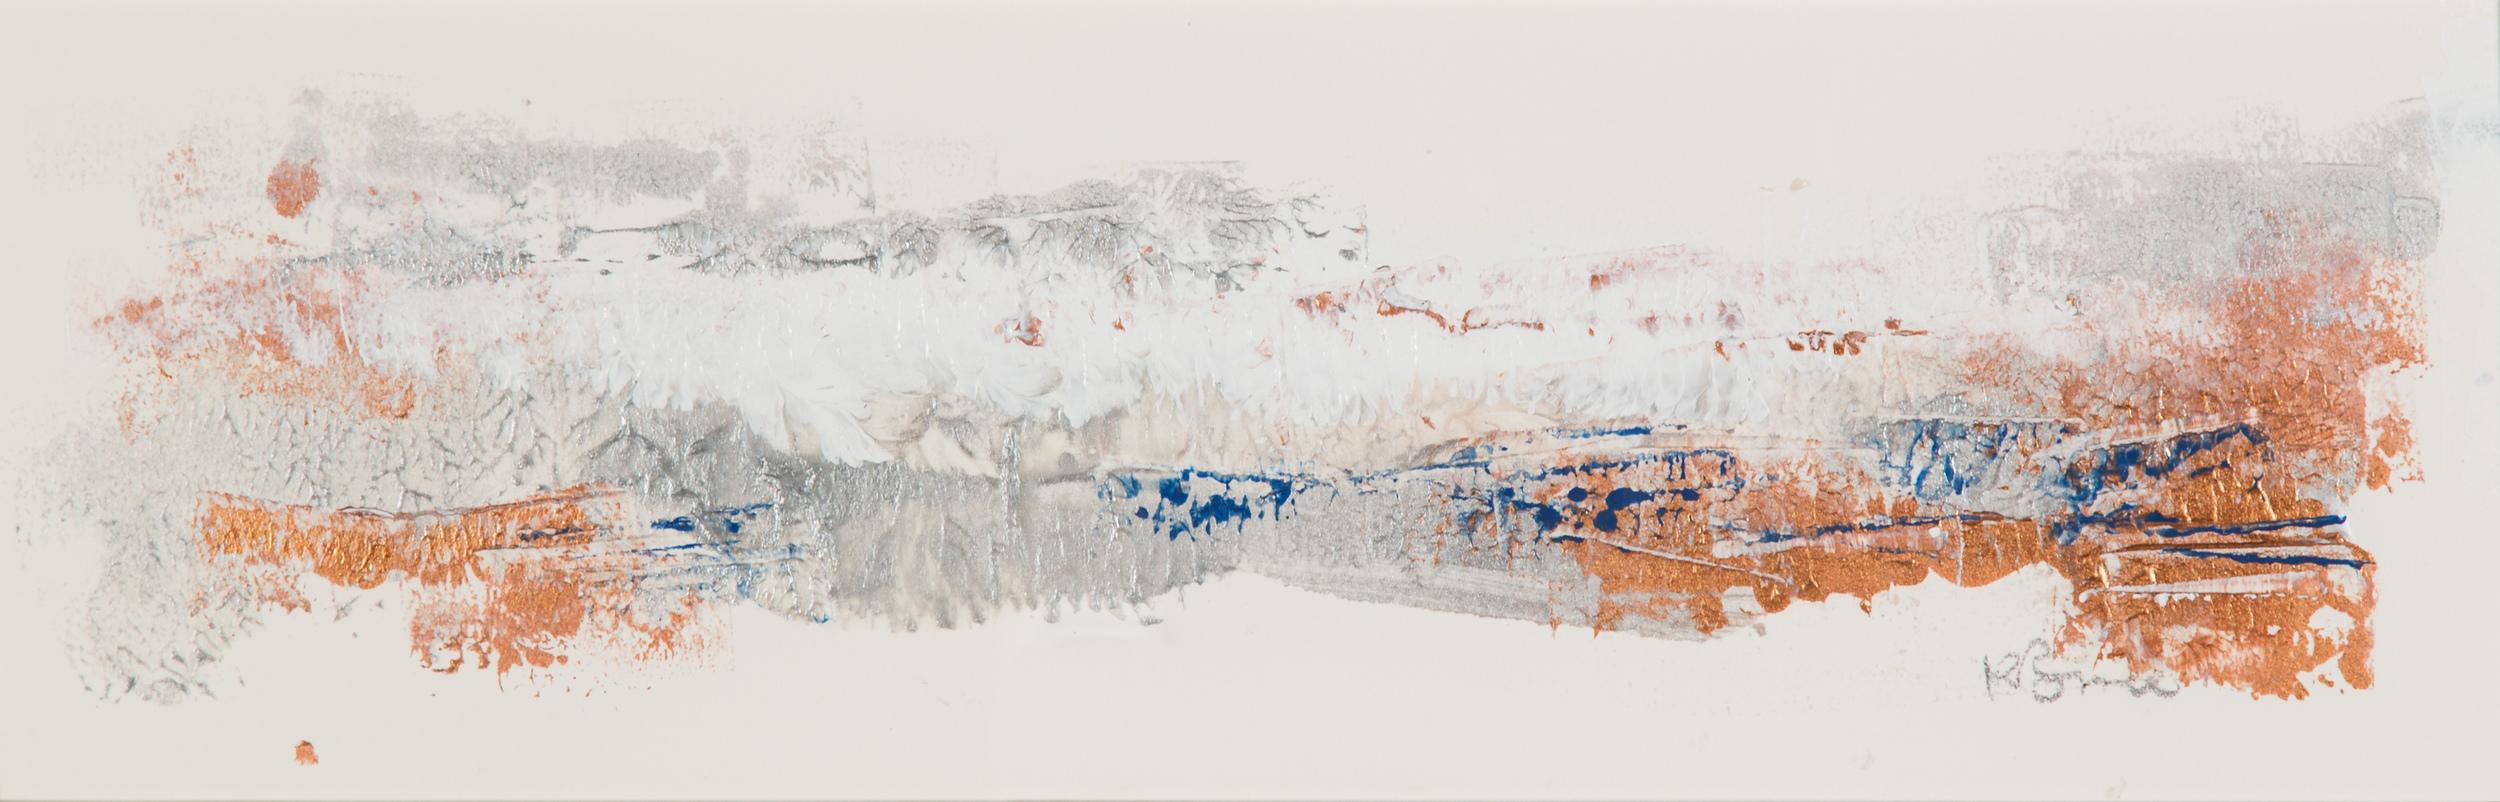 KB-075, Katharine Bruce, Changing Seasons II, 2015, Acrylic on Paper, 2015, 22x7, $1,200